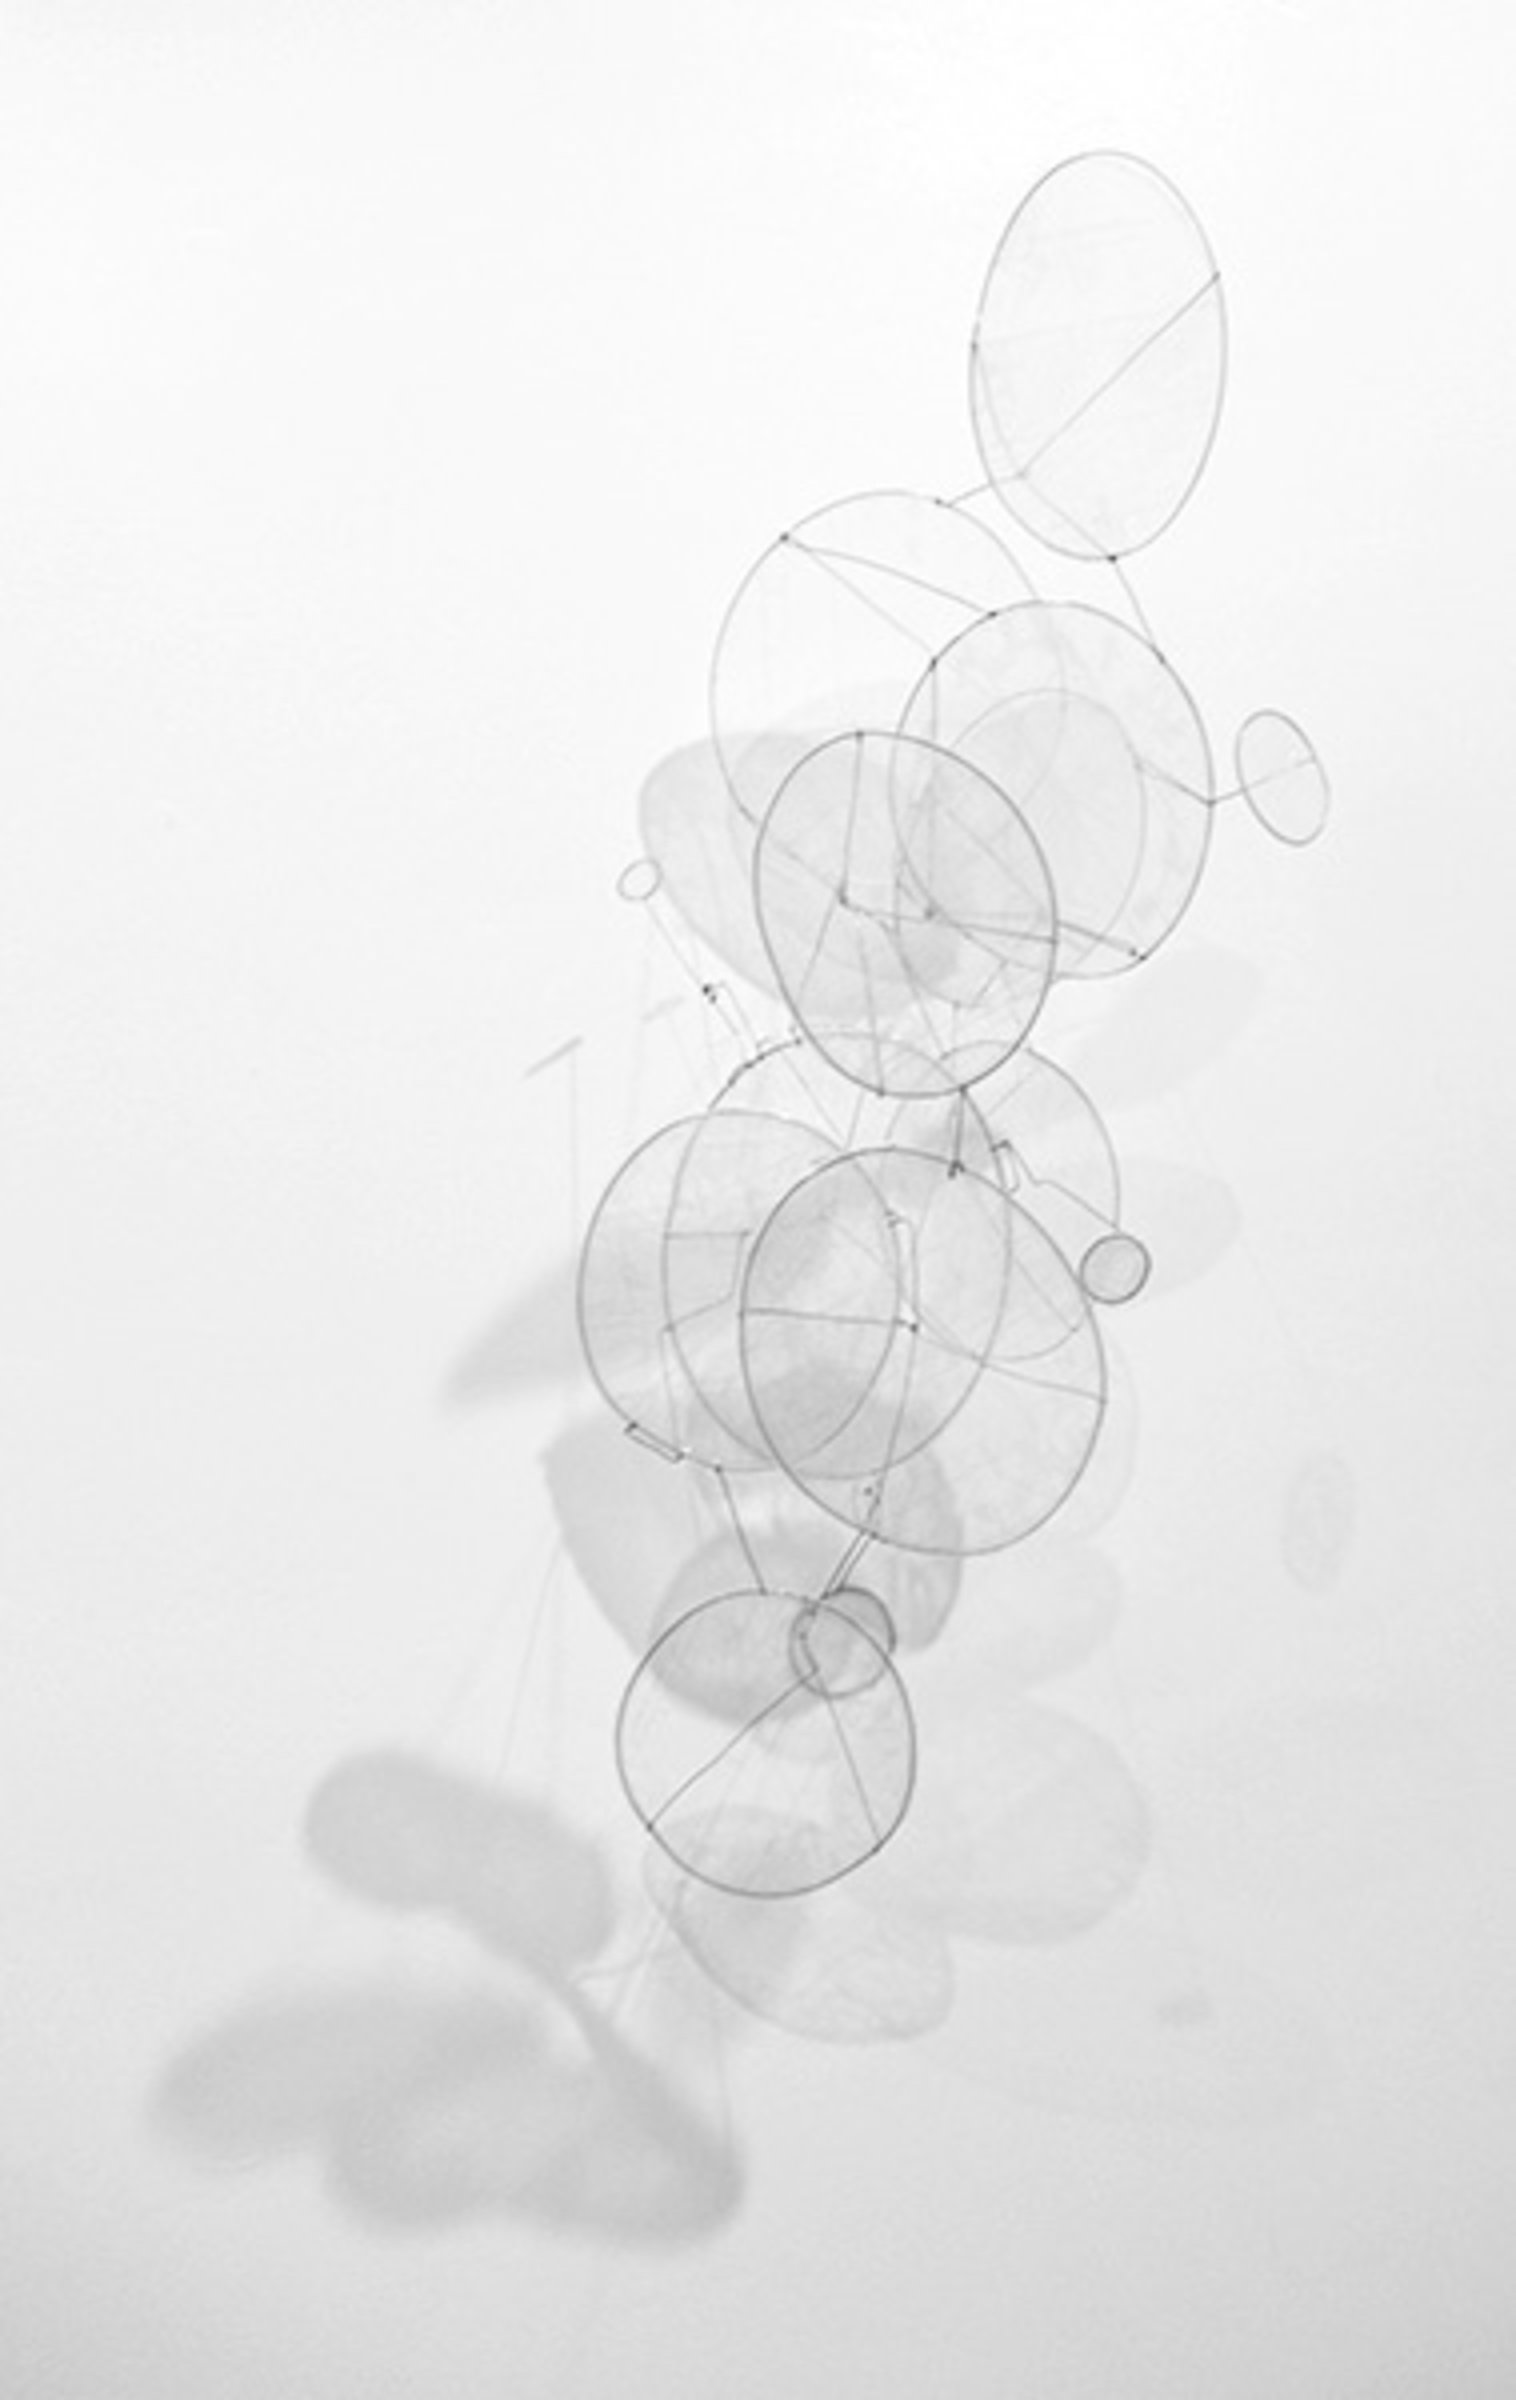 Robert Strati, Spherical Planes, 2012